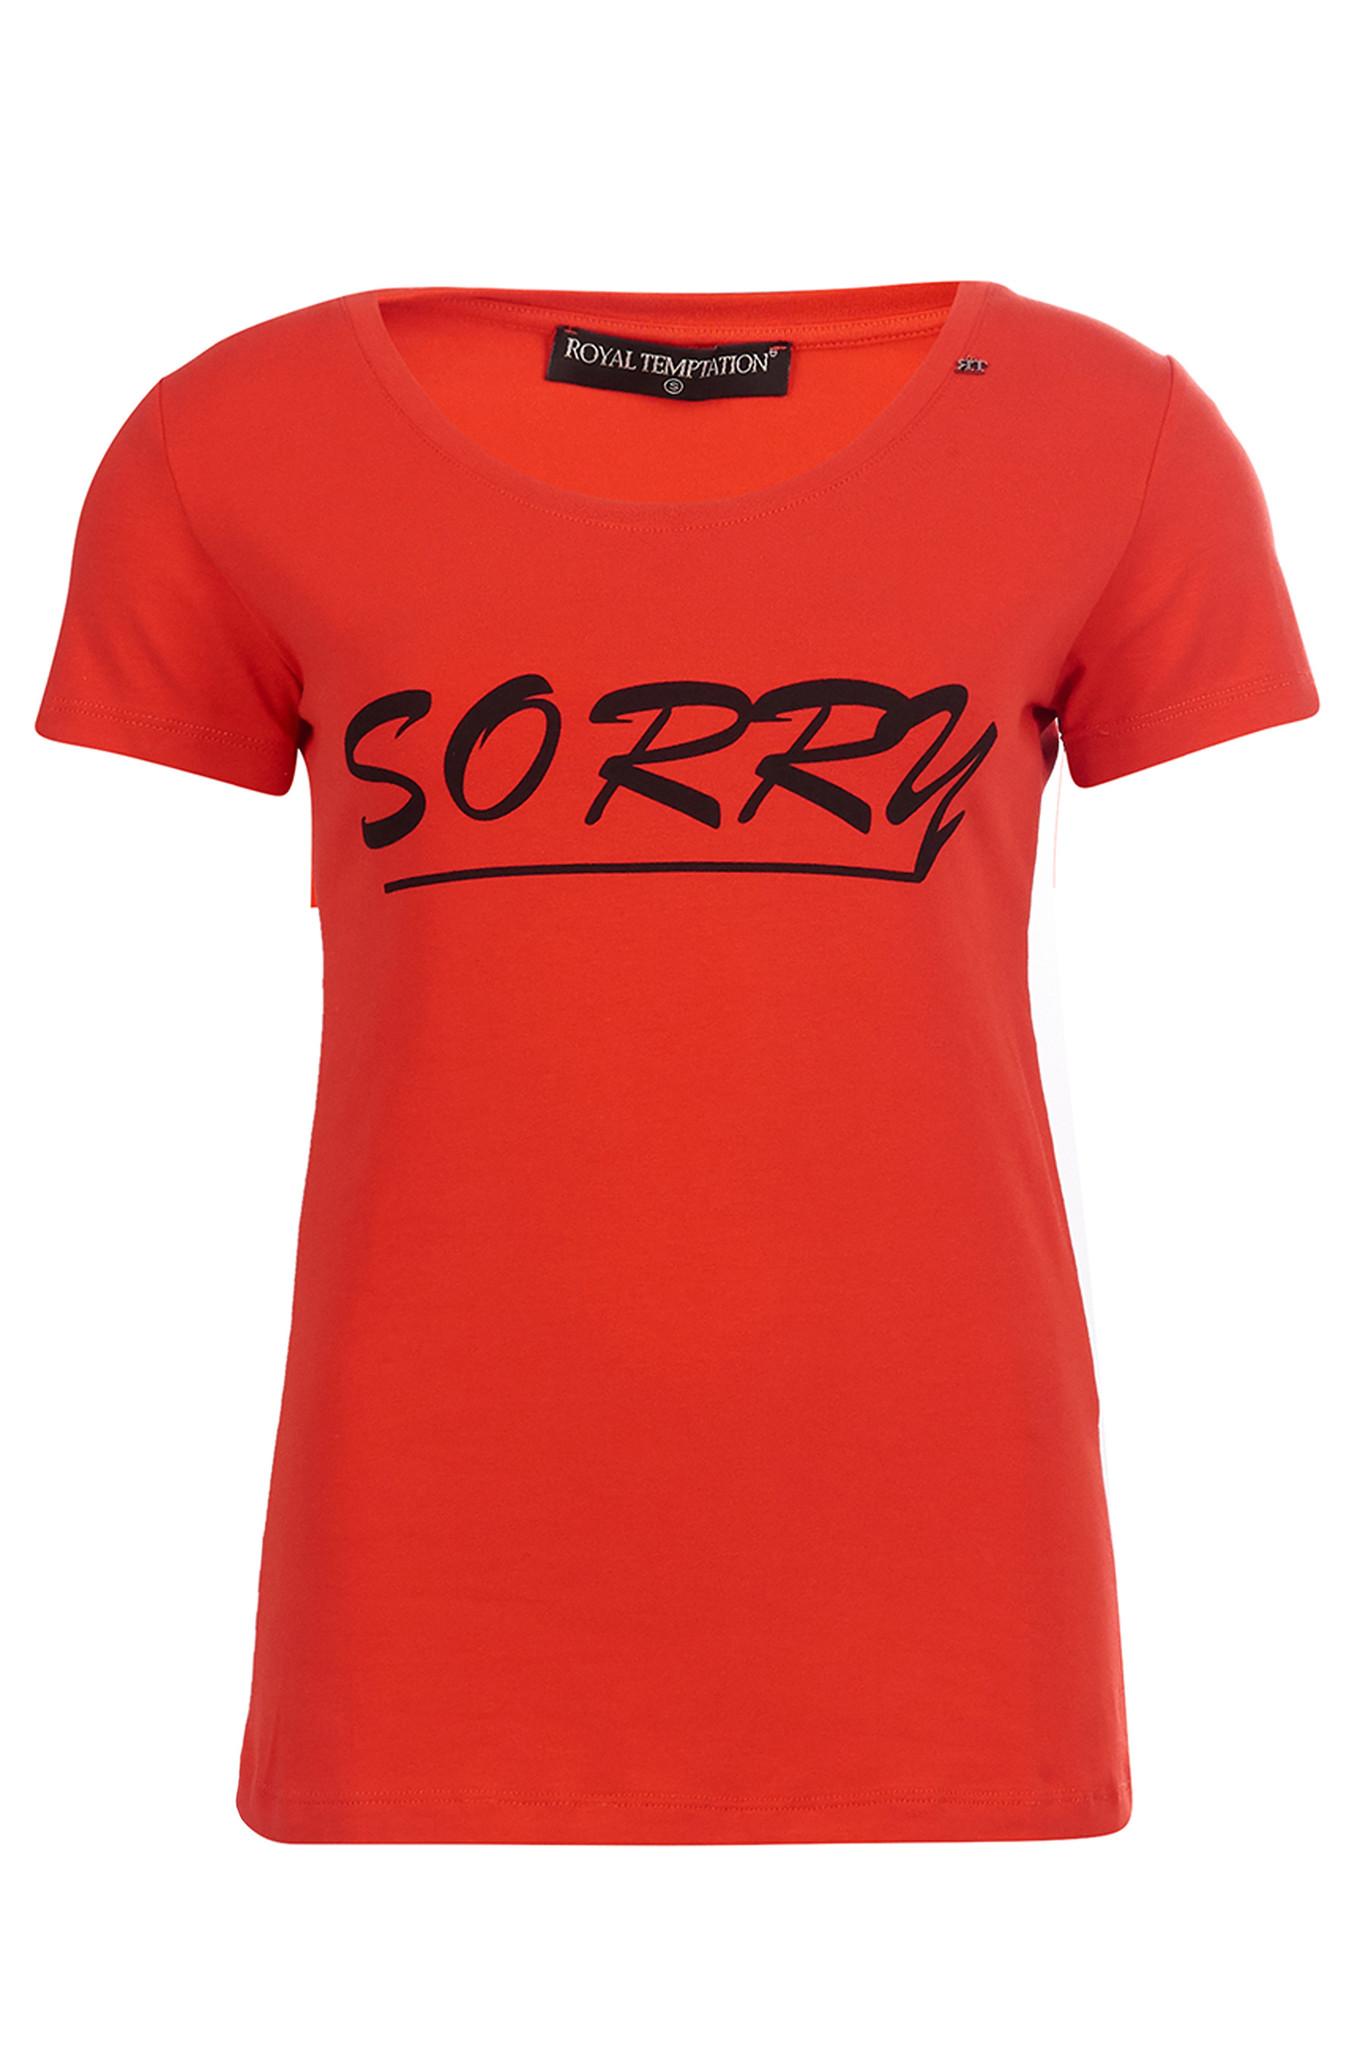 Royal Temptation Shirt sorry nog sorry rood/oranje RYL-573